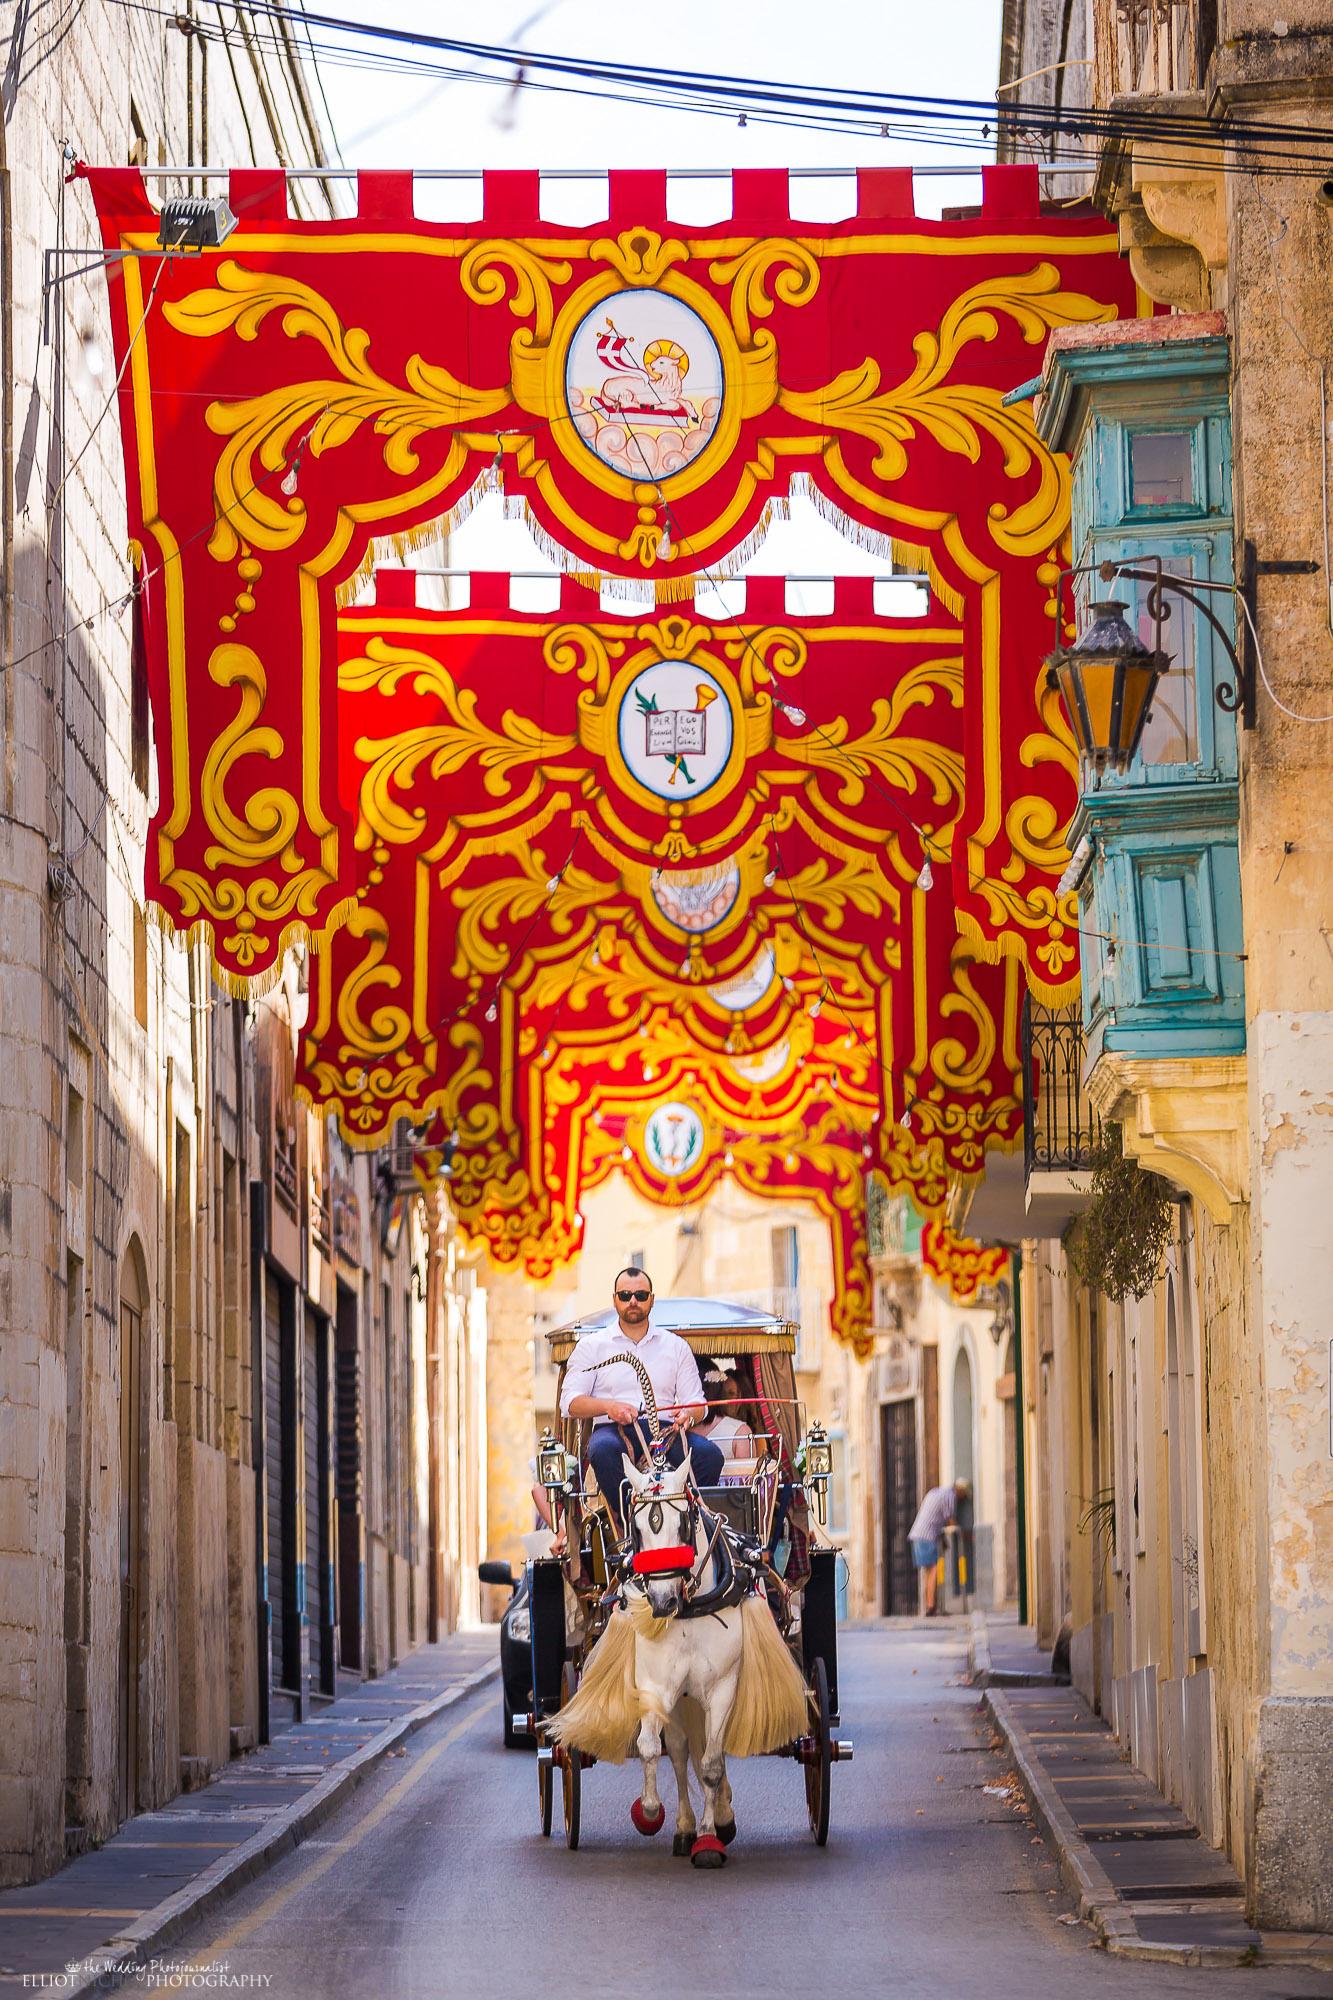 wedding-horse-carriage-wedding-photography-destination-Malta